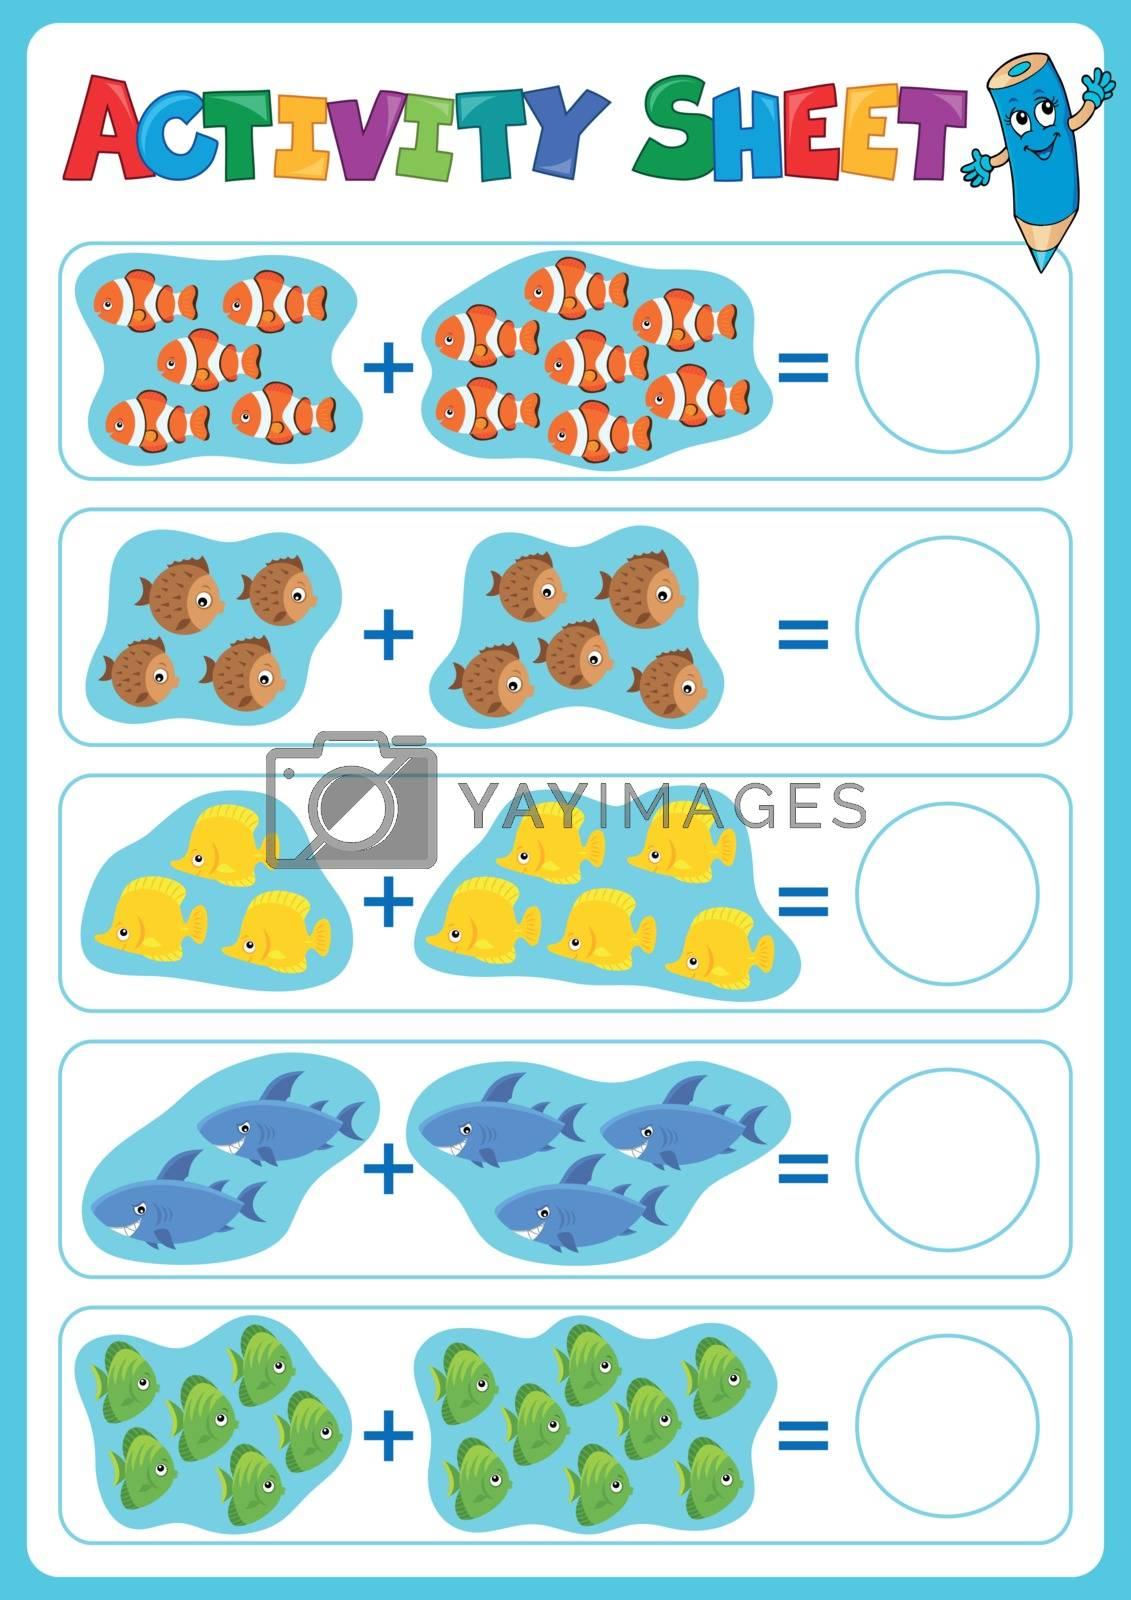 Activity sheet topic image 5 - eps10 vector illustration.